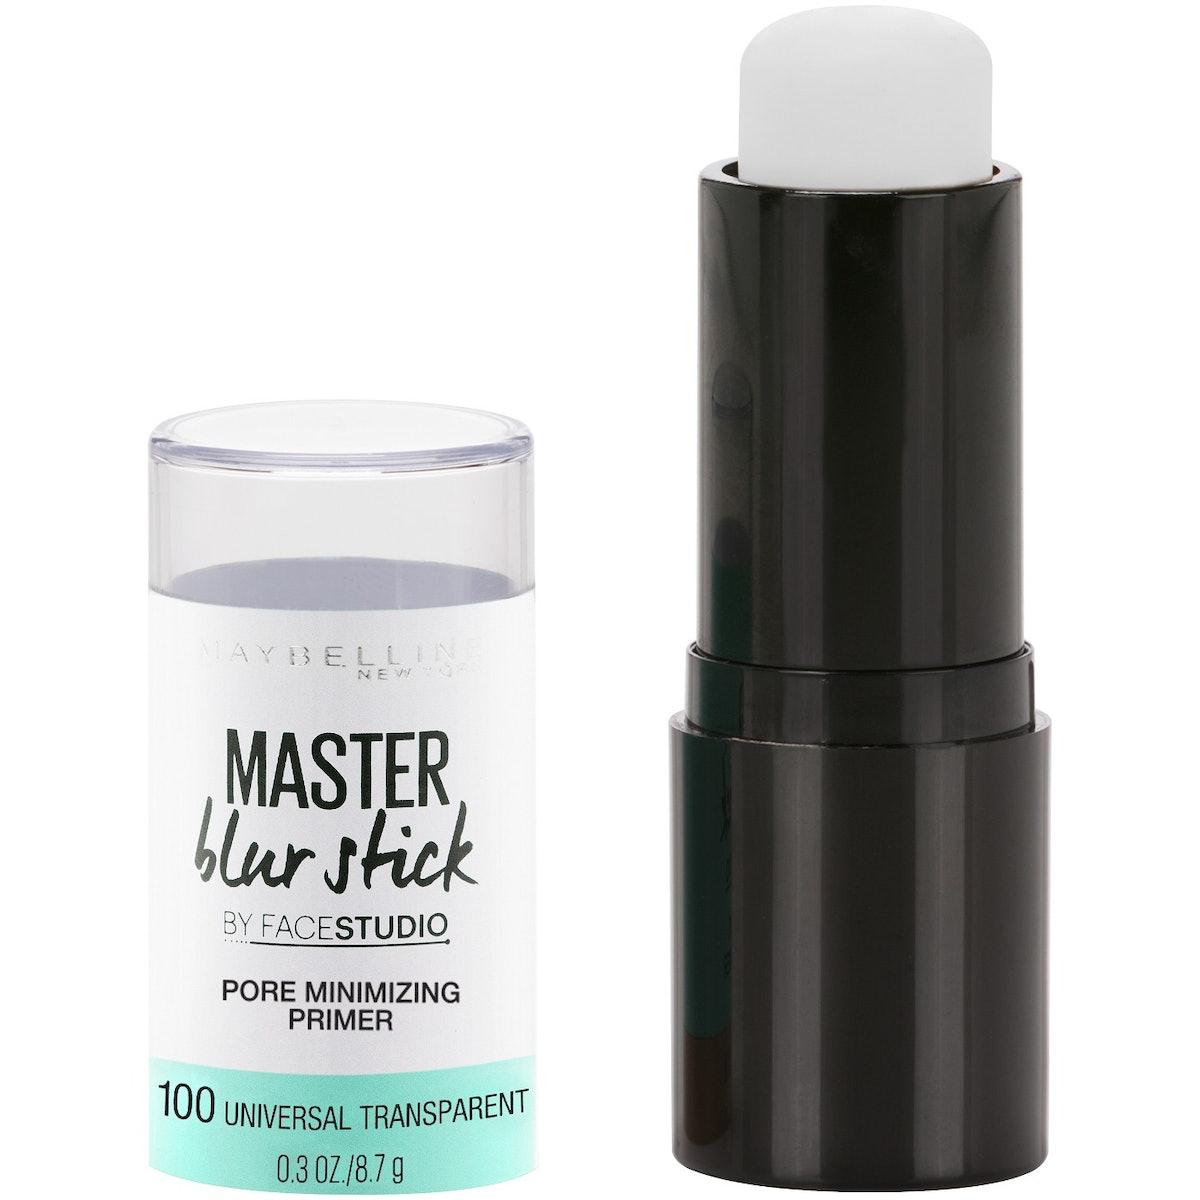 Maybelline Facestudio Master Blur Stick Primer